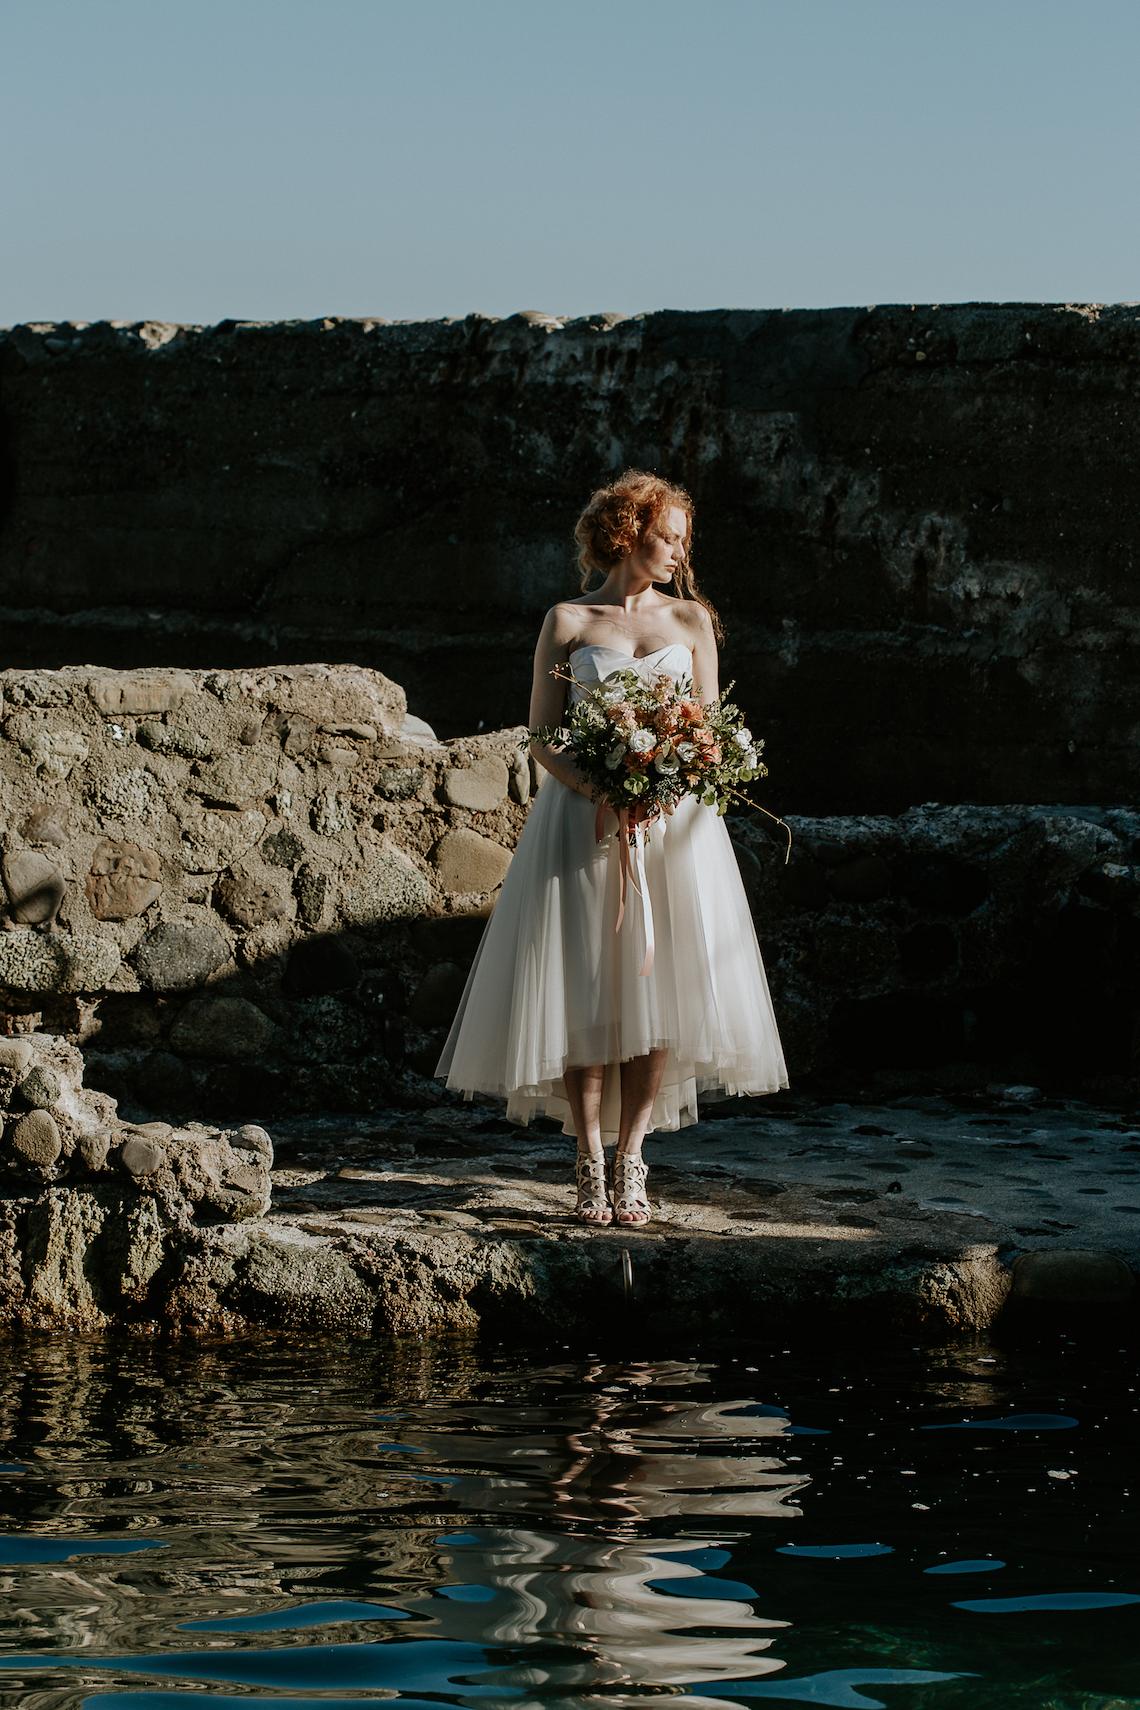 Rose Gold and Copper Cinque Terre Fall Wedding Inspiration – Di Luce e d Ombra – Greta Betton Wedding Planner 11